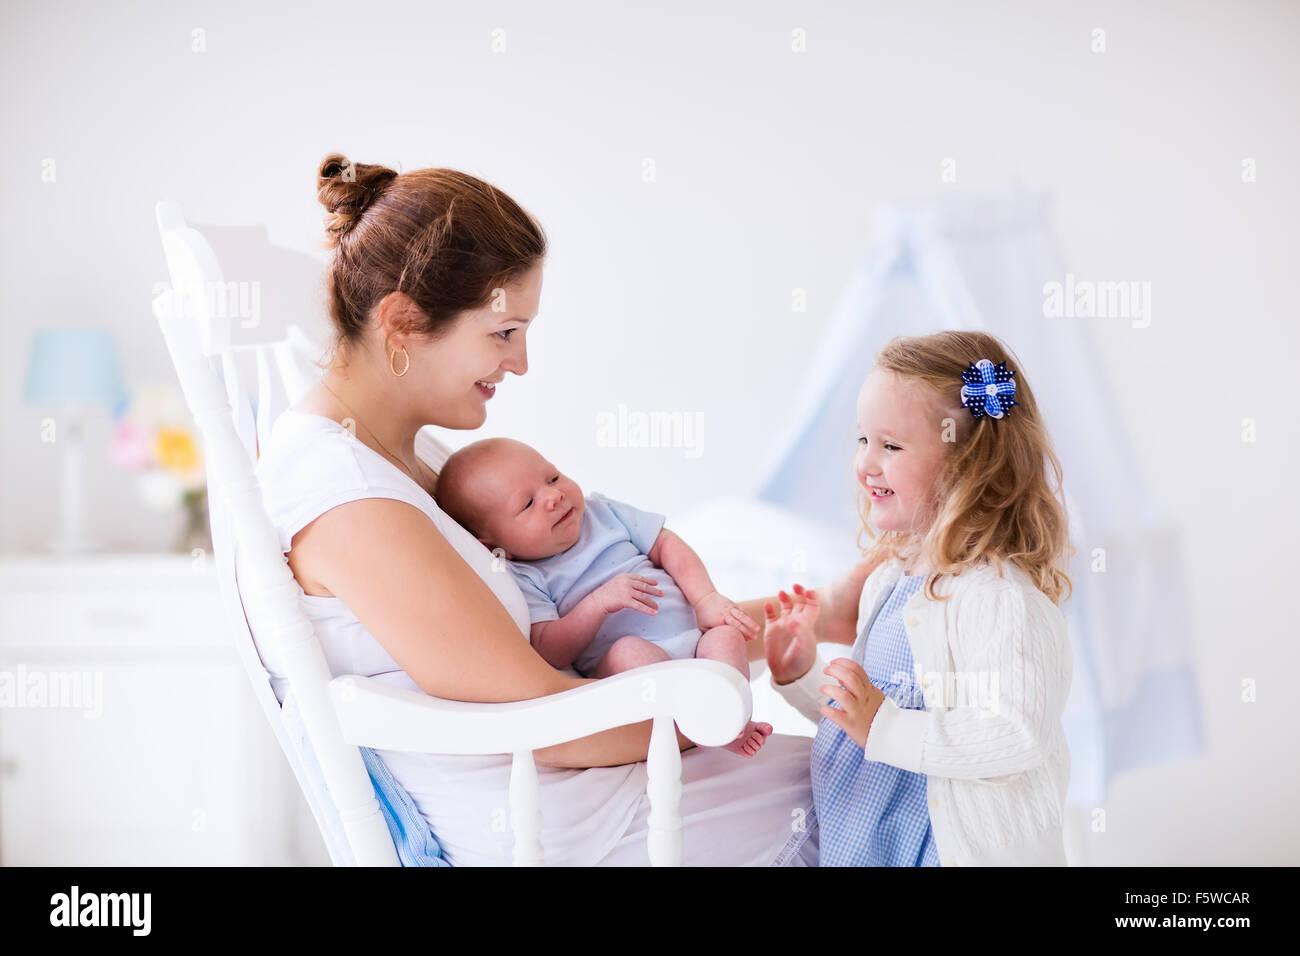 c8bf66ee695af Little sister hugging her newborn brother. Toddler kid meeting new ...